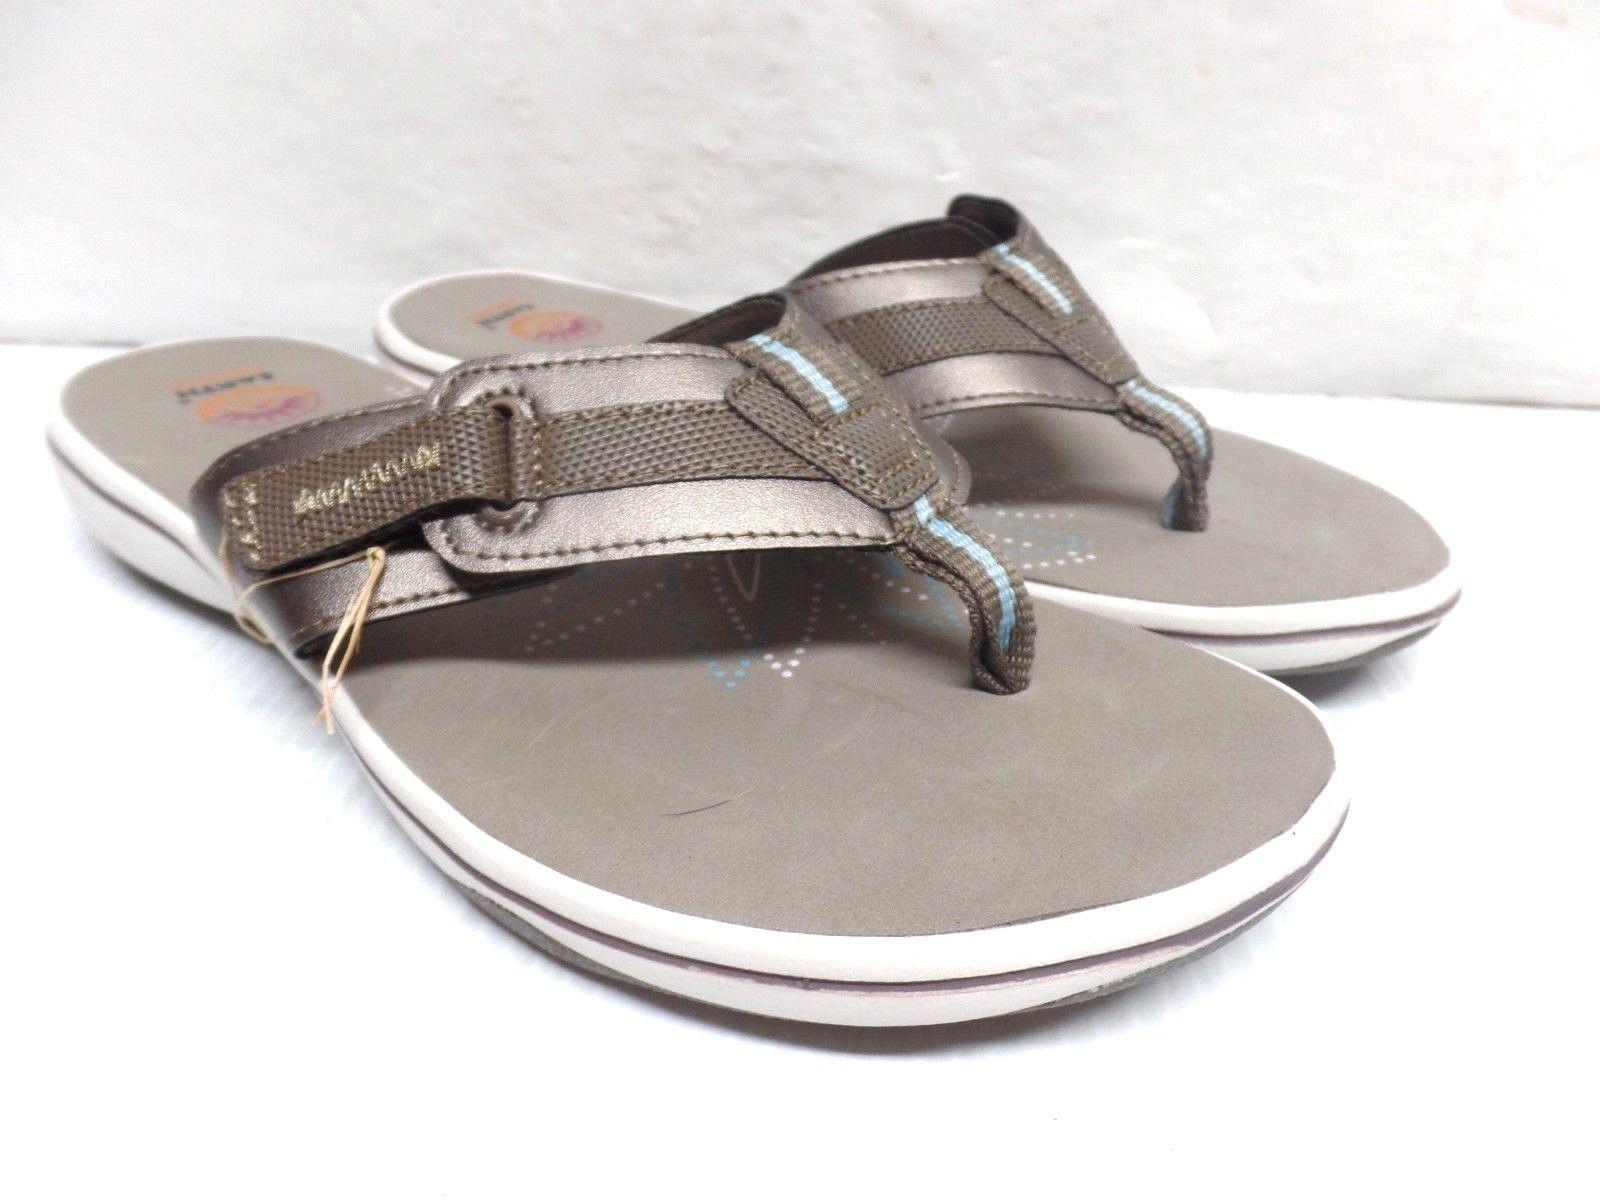 974284d5 Earth Spirit womens Khaki comfort flip flops and 39 similar items